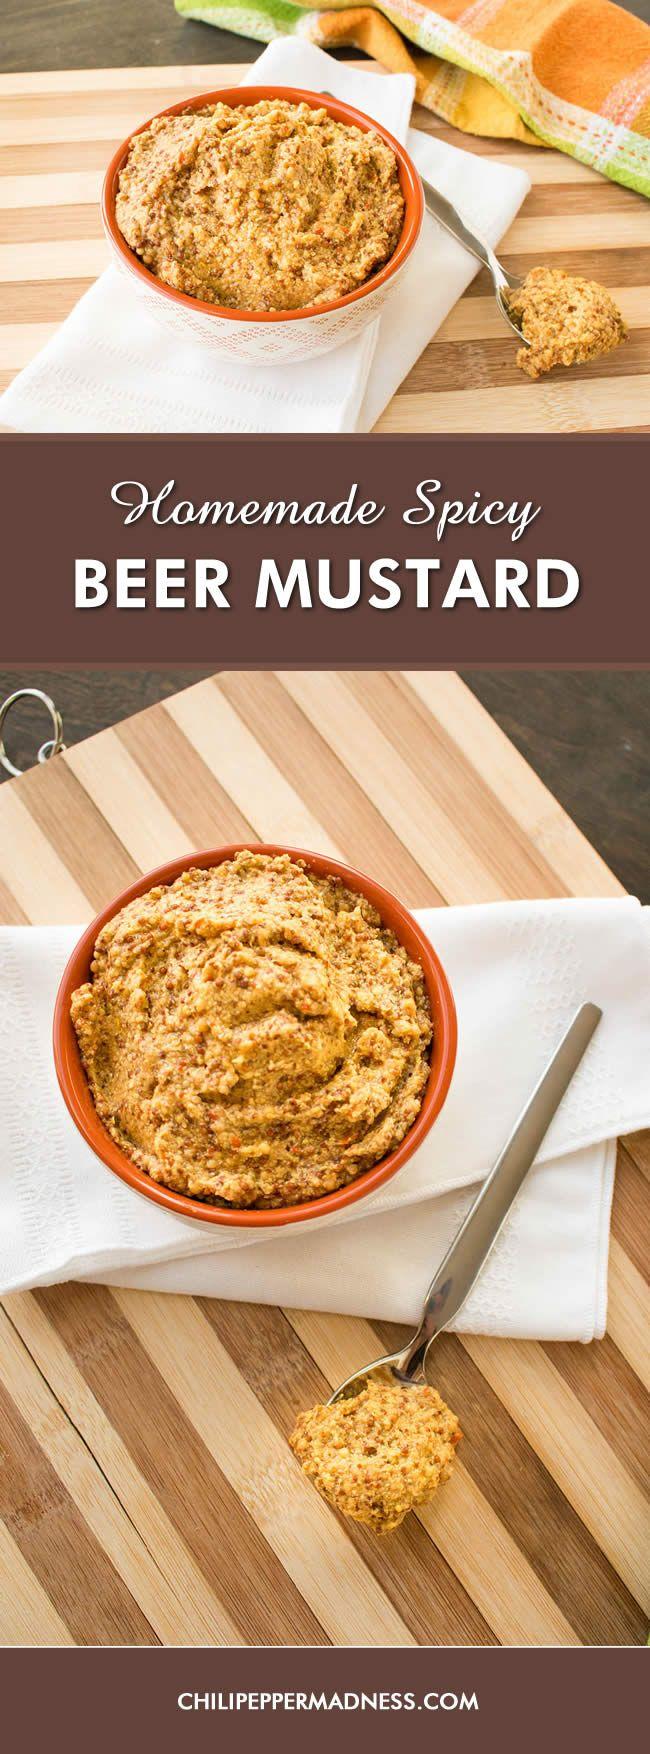 Homemade Whole Grain Spicy Beer Mustard - Recipe